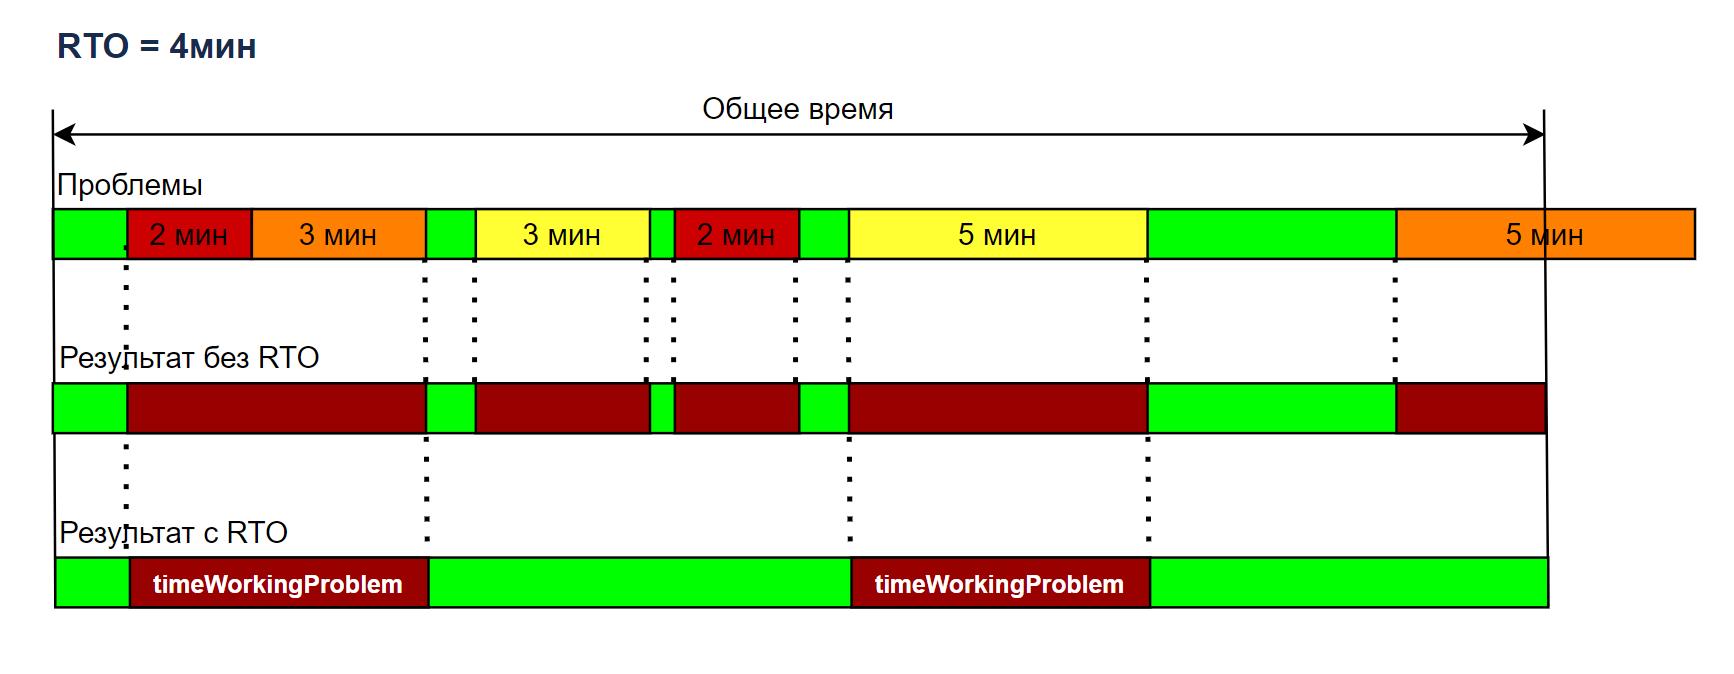 Рис. 2 Пример влияния RTO на расчет функции fProblem(t)